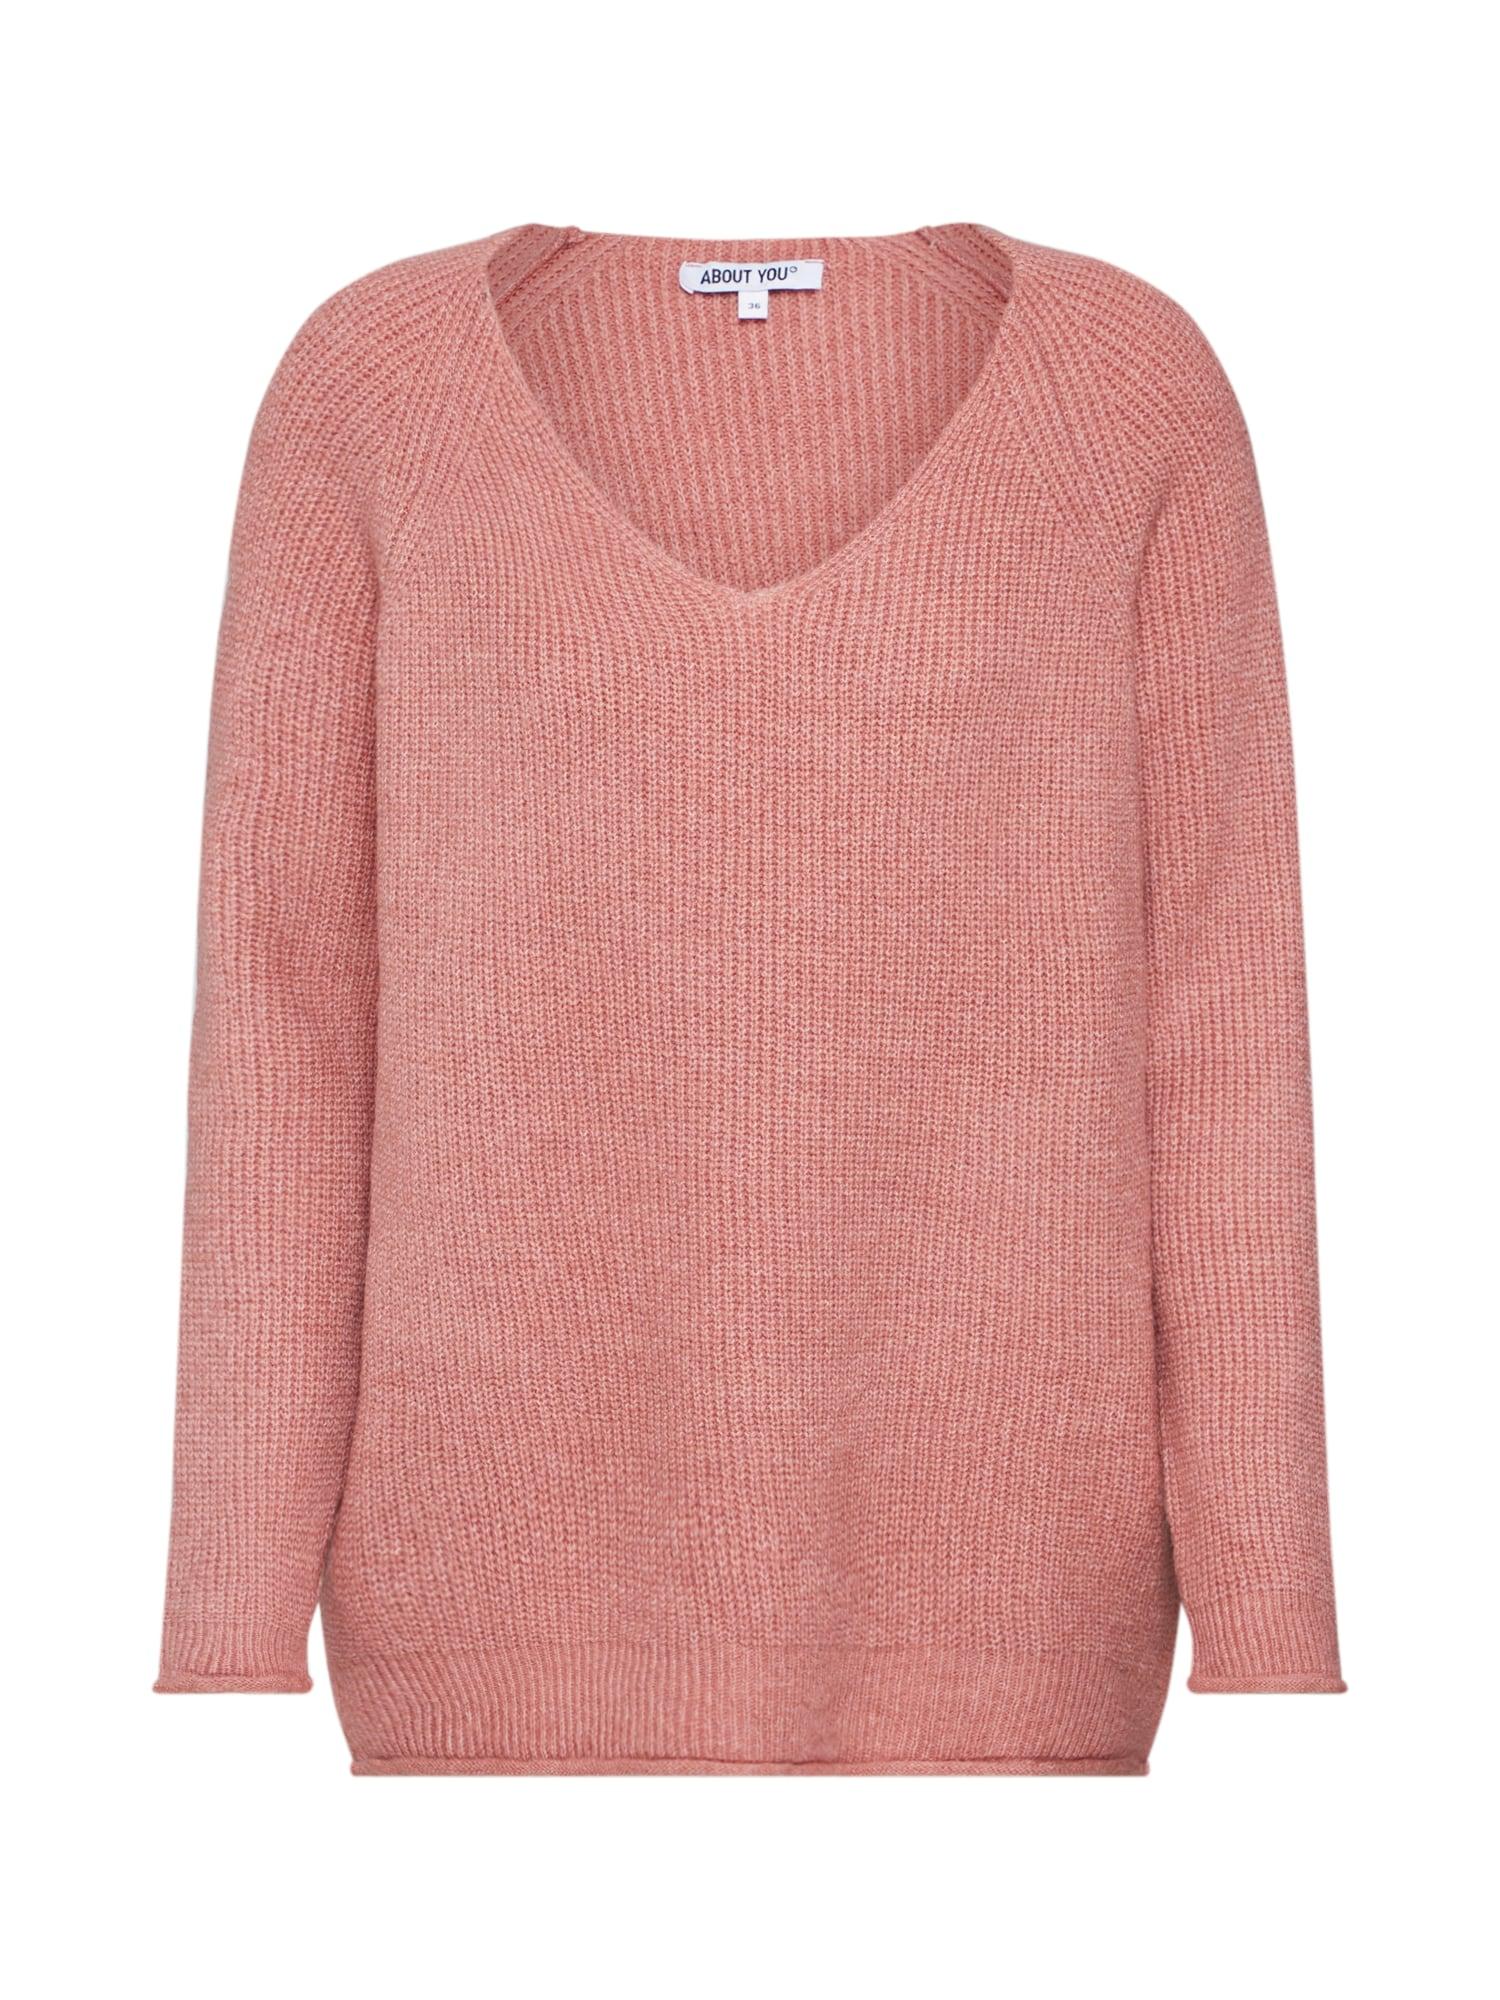 ABOUT YOU Megztinis 'Laren Jumper' rožių spalva